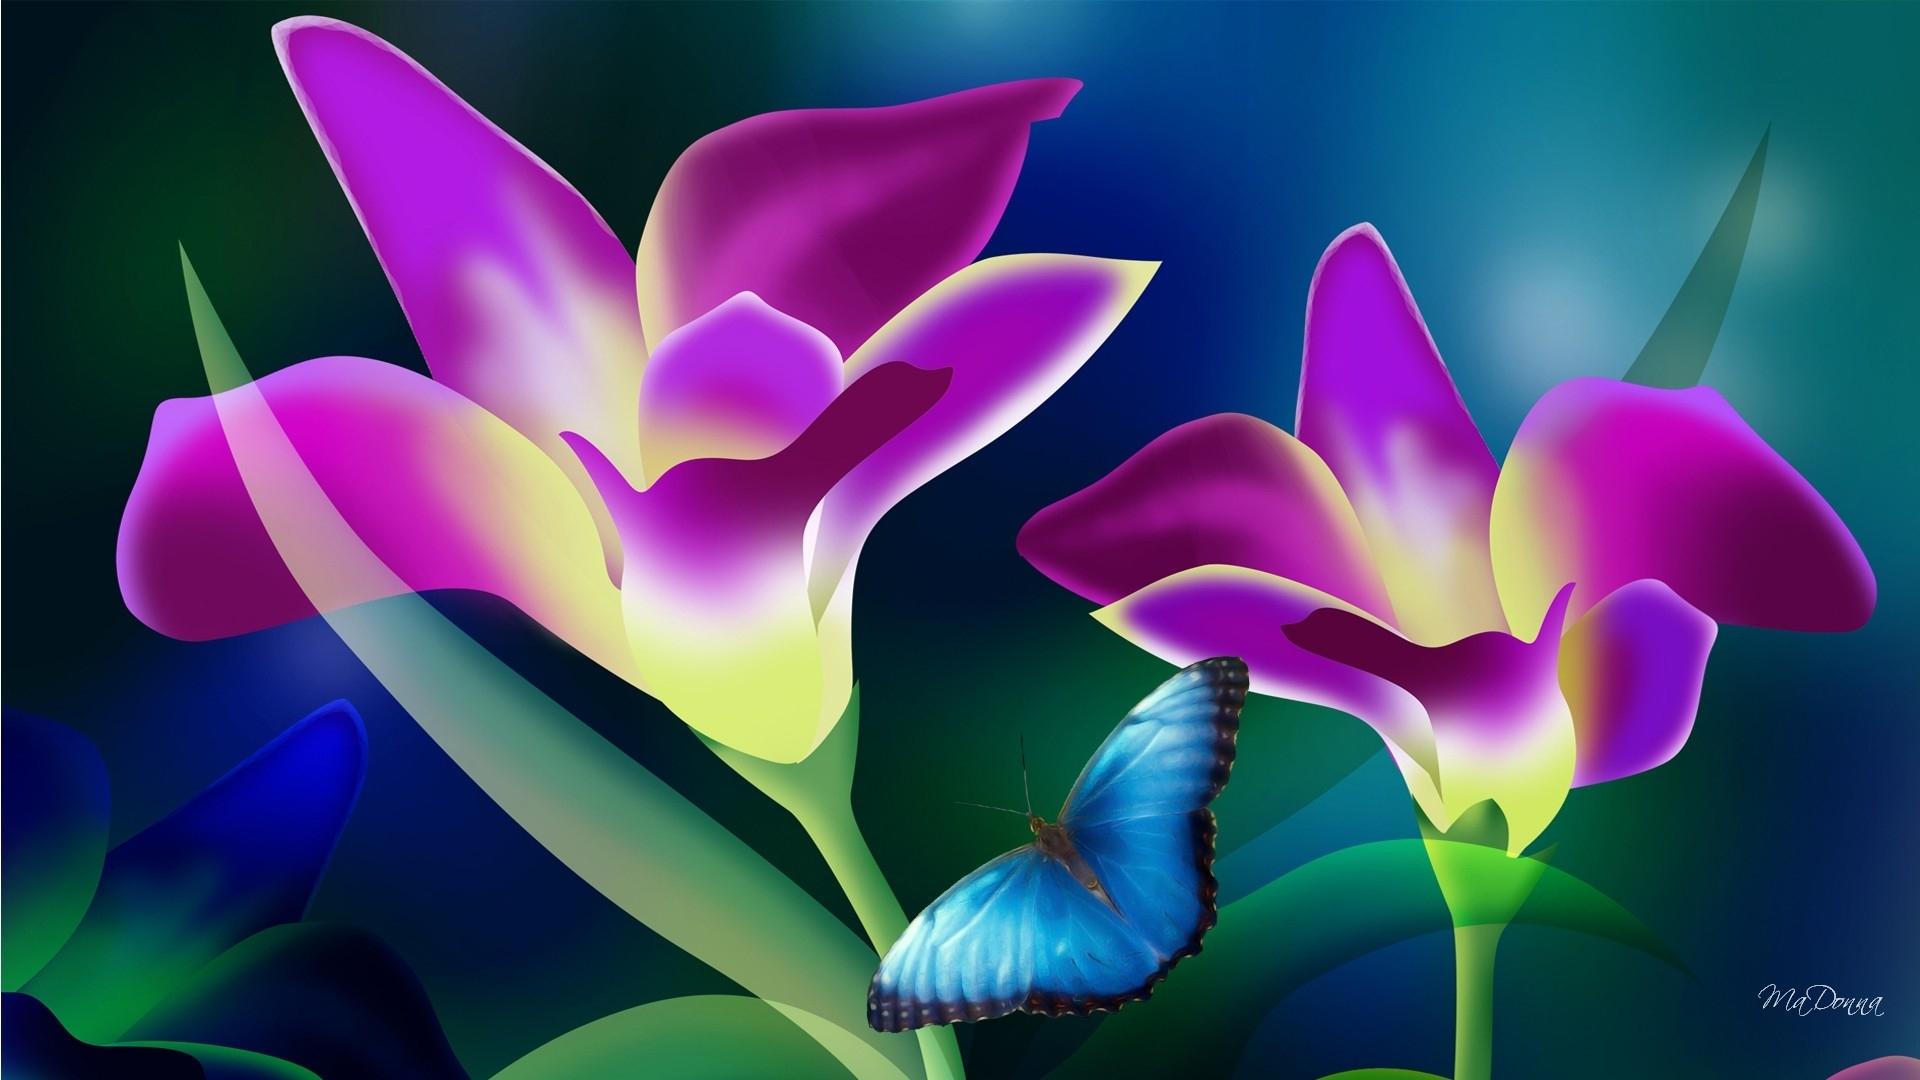 tropical flowers wallpaper   1920x1080   #42569   flowers